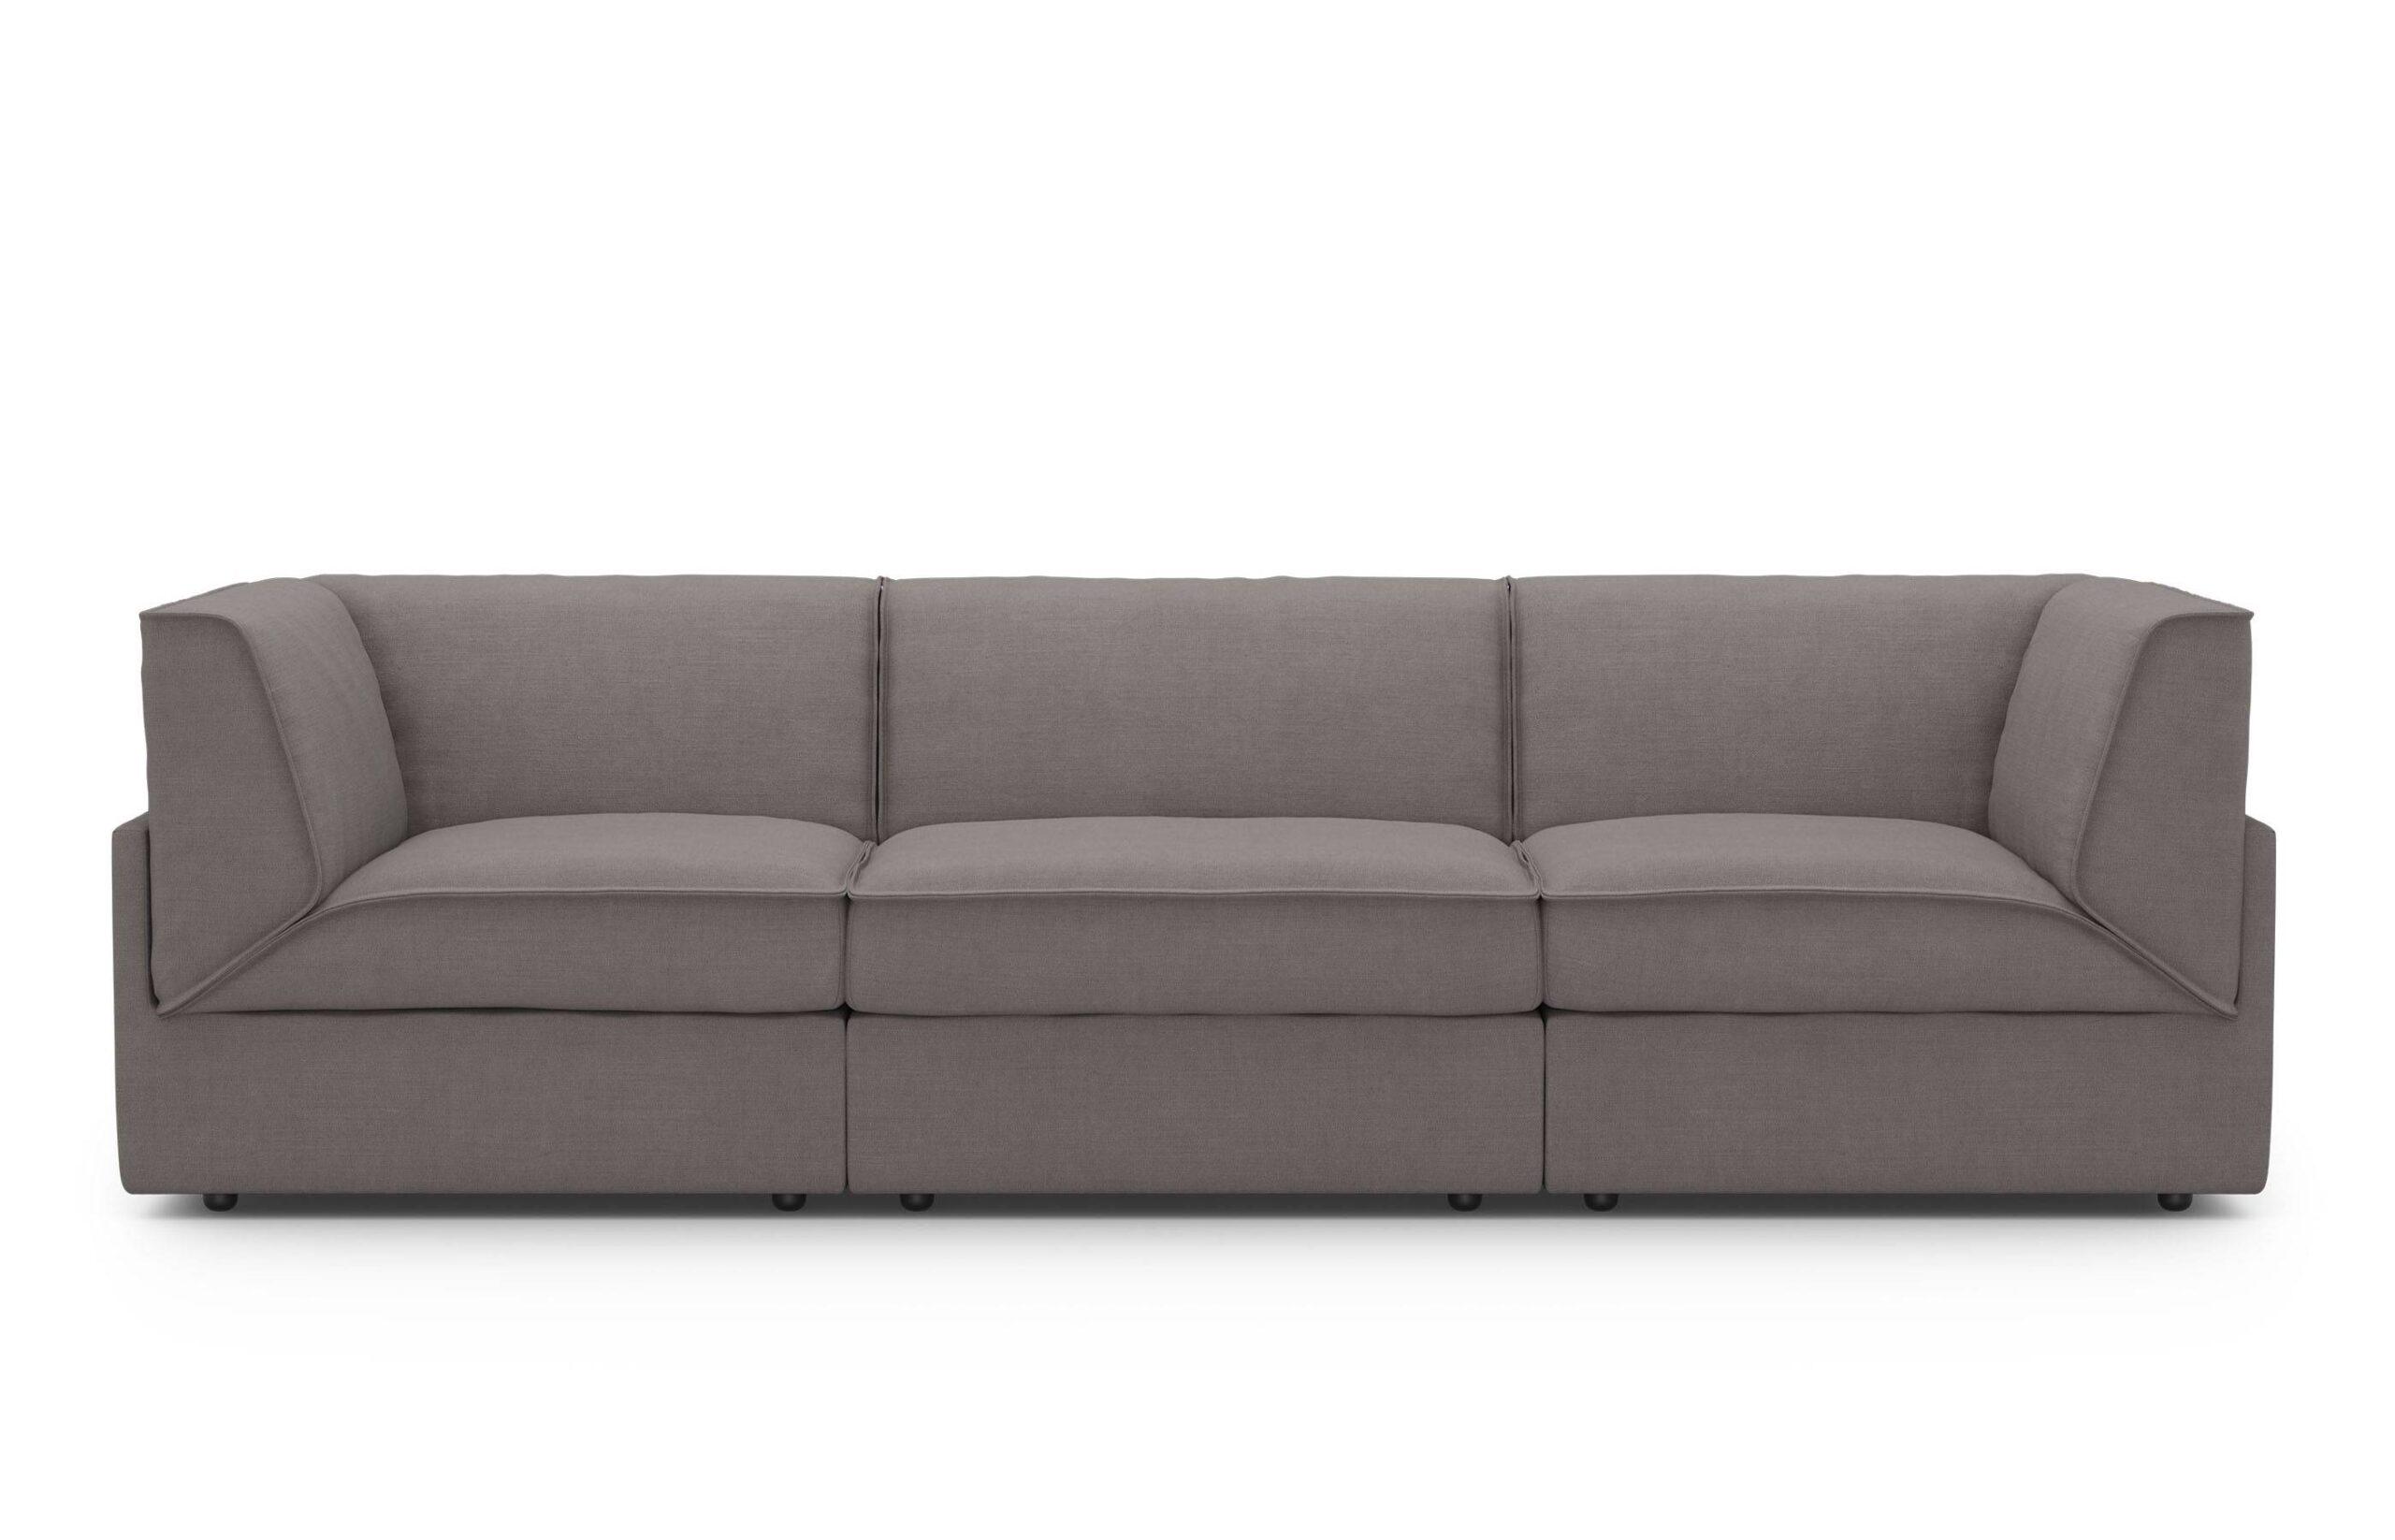 Full Size of Sofa 3 Sitzer Grau Rattan Ikea Couch Mit Schlaffunktion Fila Sitzfeldtcom Relaxfunktion Kleines Wohnzimmer Kissen 2 Ottomane Walter Knoll Graues Bett Aus Sofa Sofa 3 Sitzer Grau